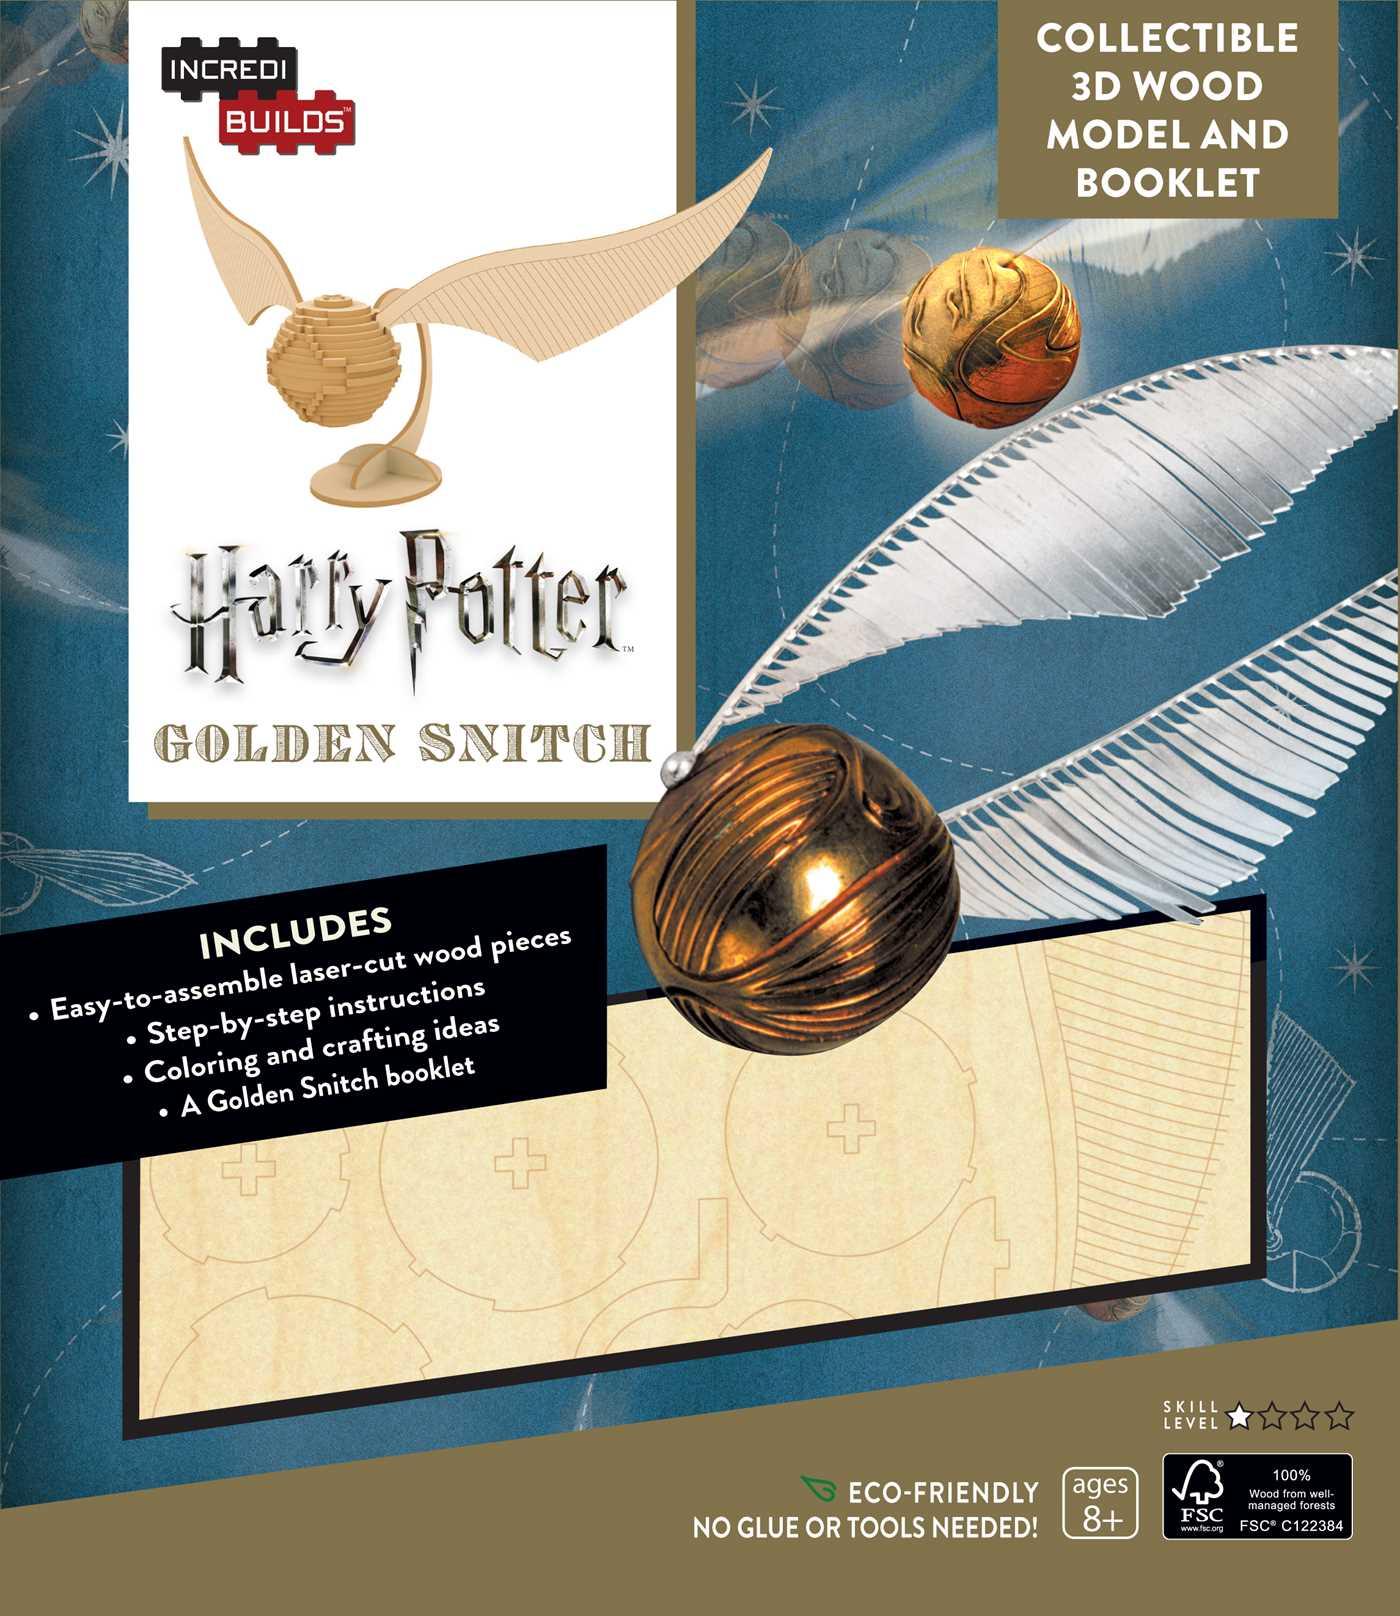 Incredibuilds Harry Potter Golden Snitch 3d Wood Model And Booklet 9781682980309 Hr